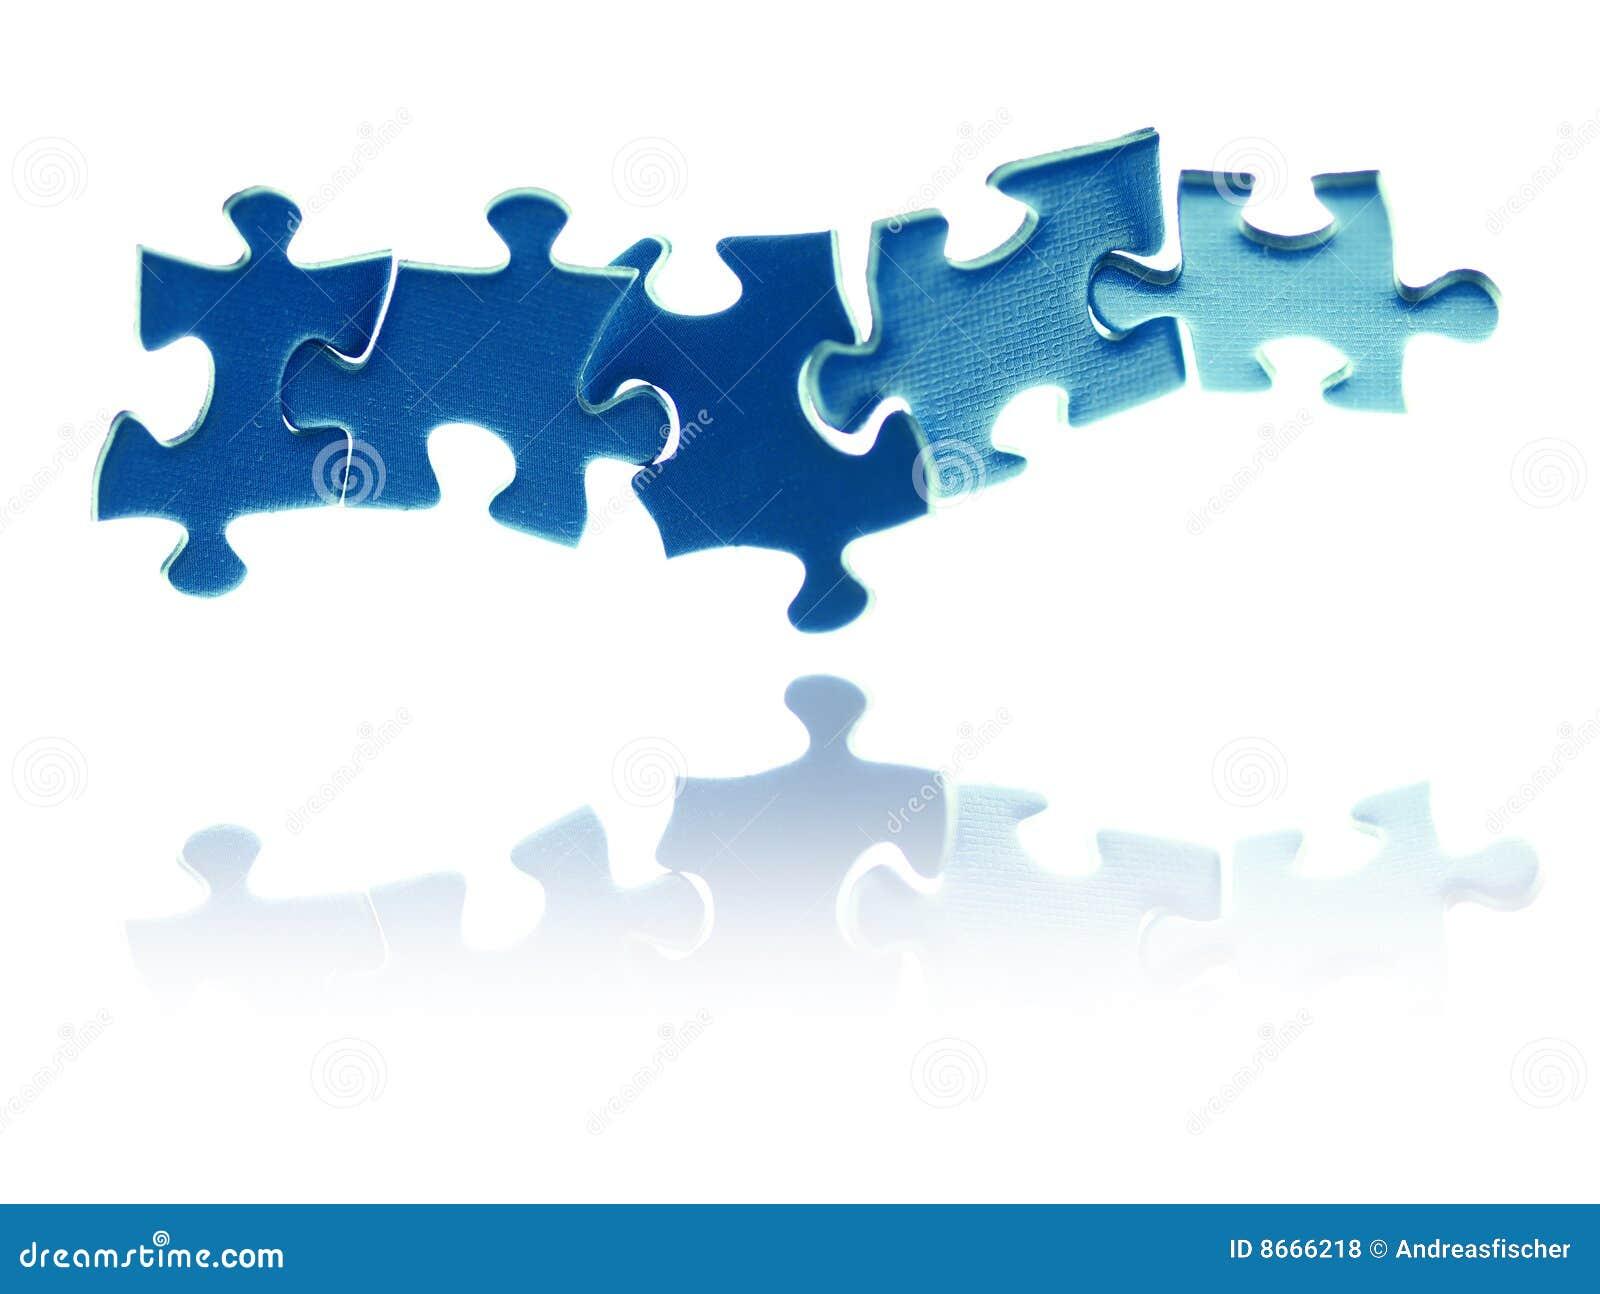 Parties de verrouillage de puzzle